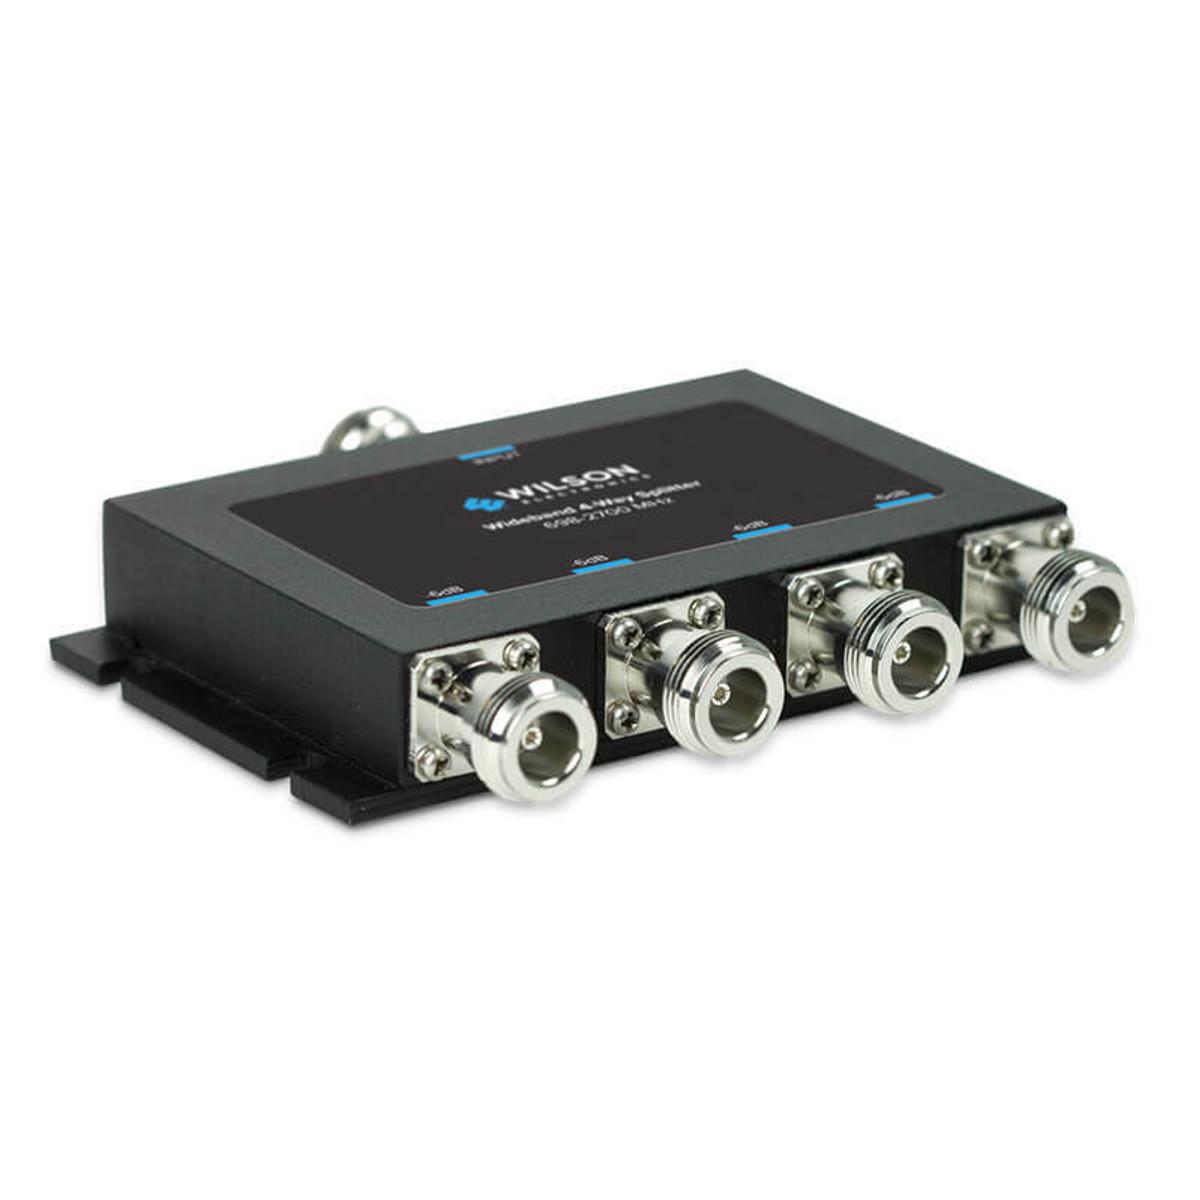 Wilson Electronics weBoost Wilson 859981 -6dB 4-Way Splitter for 700-2700MHz or 50 Ohm